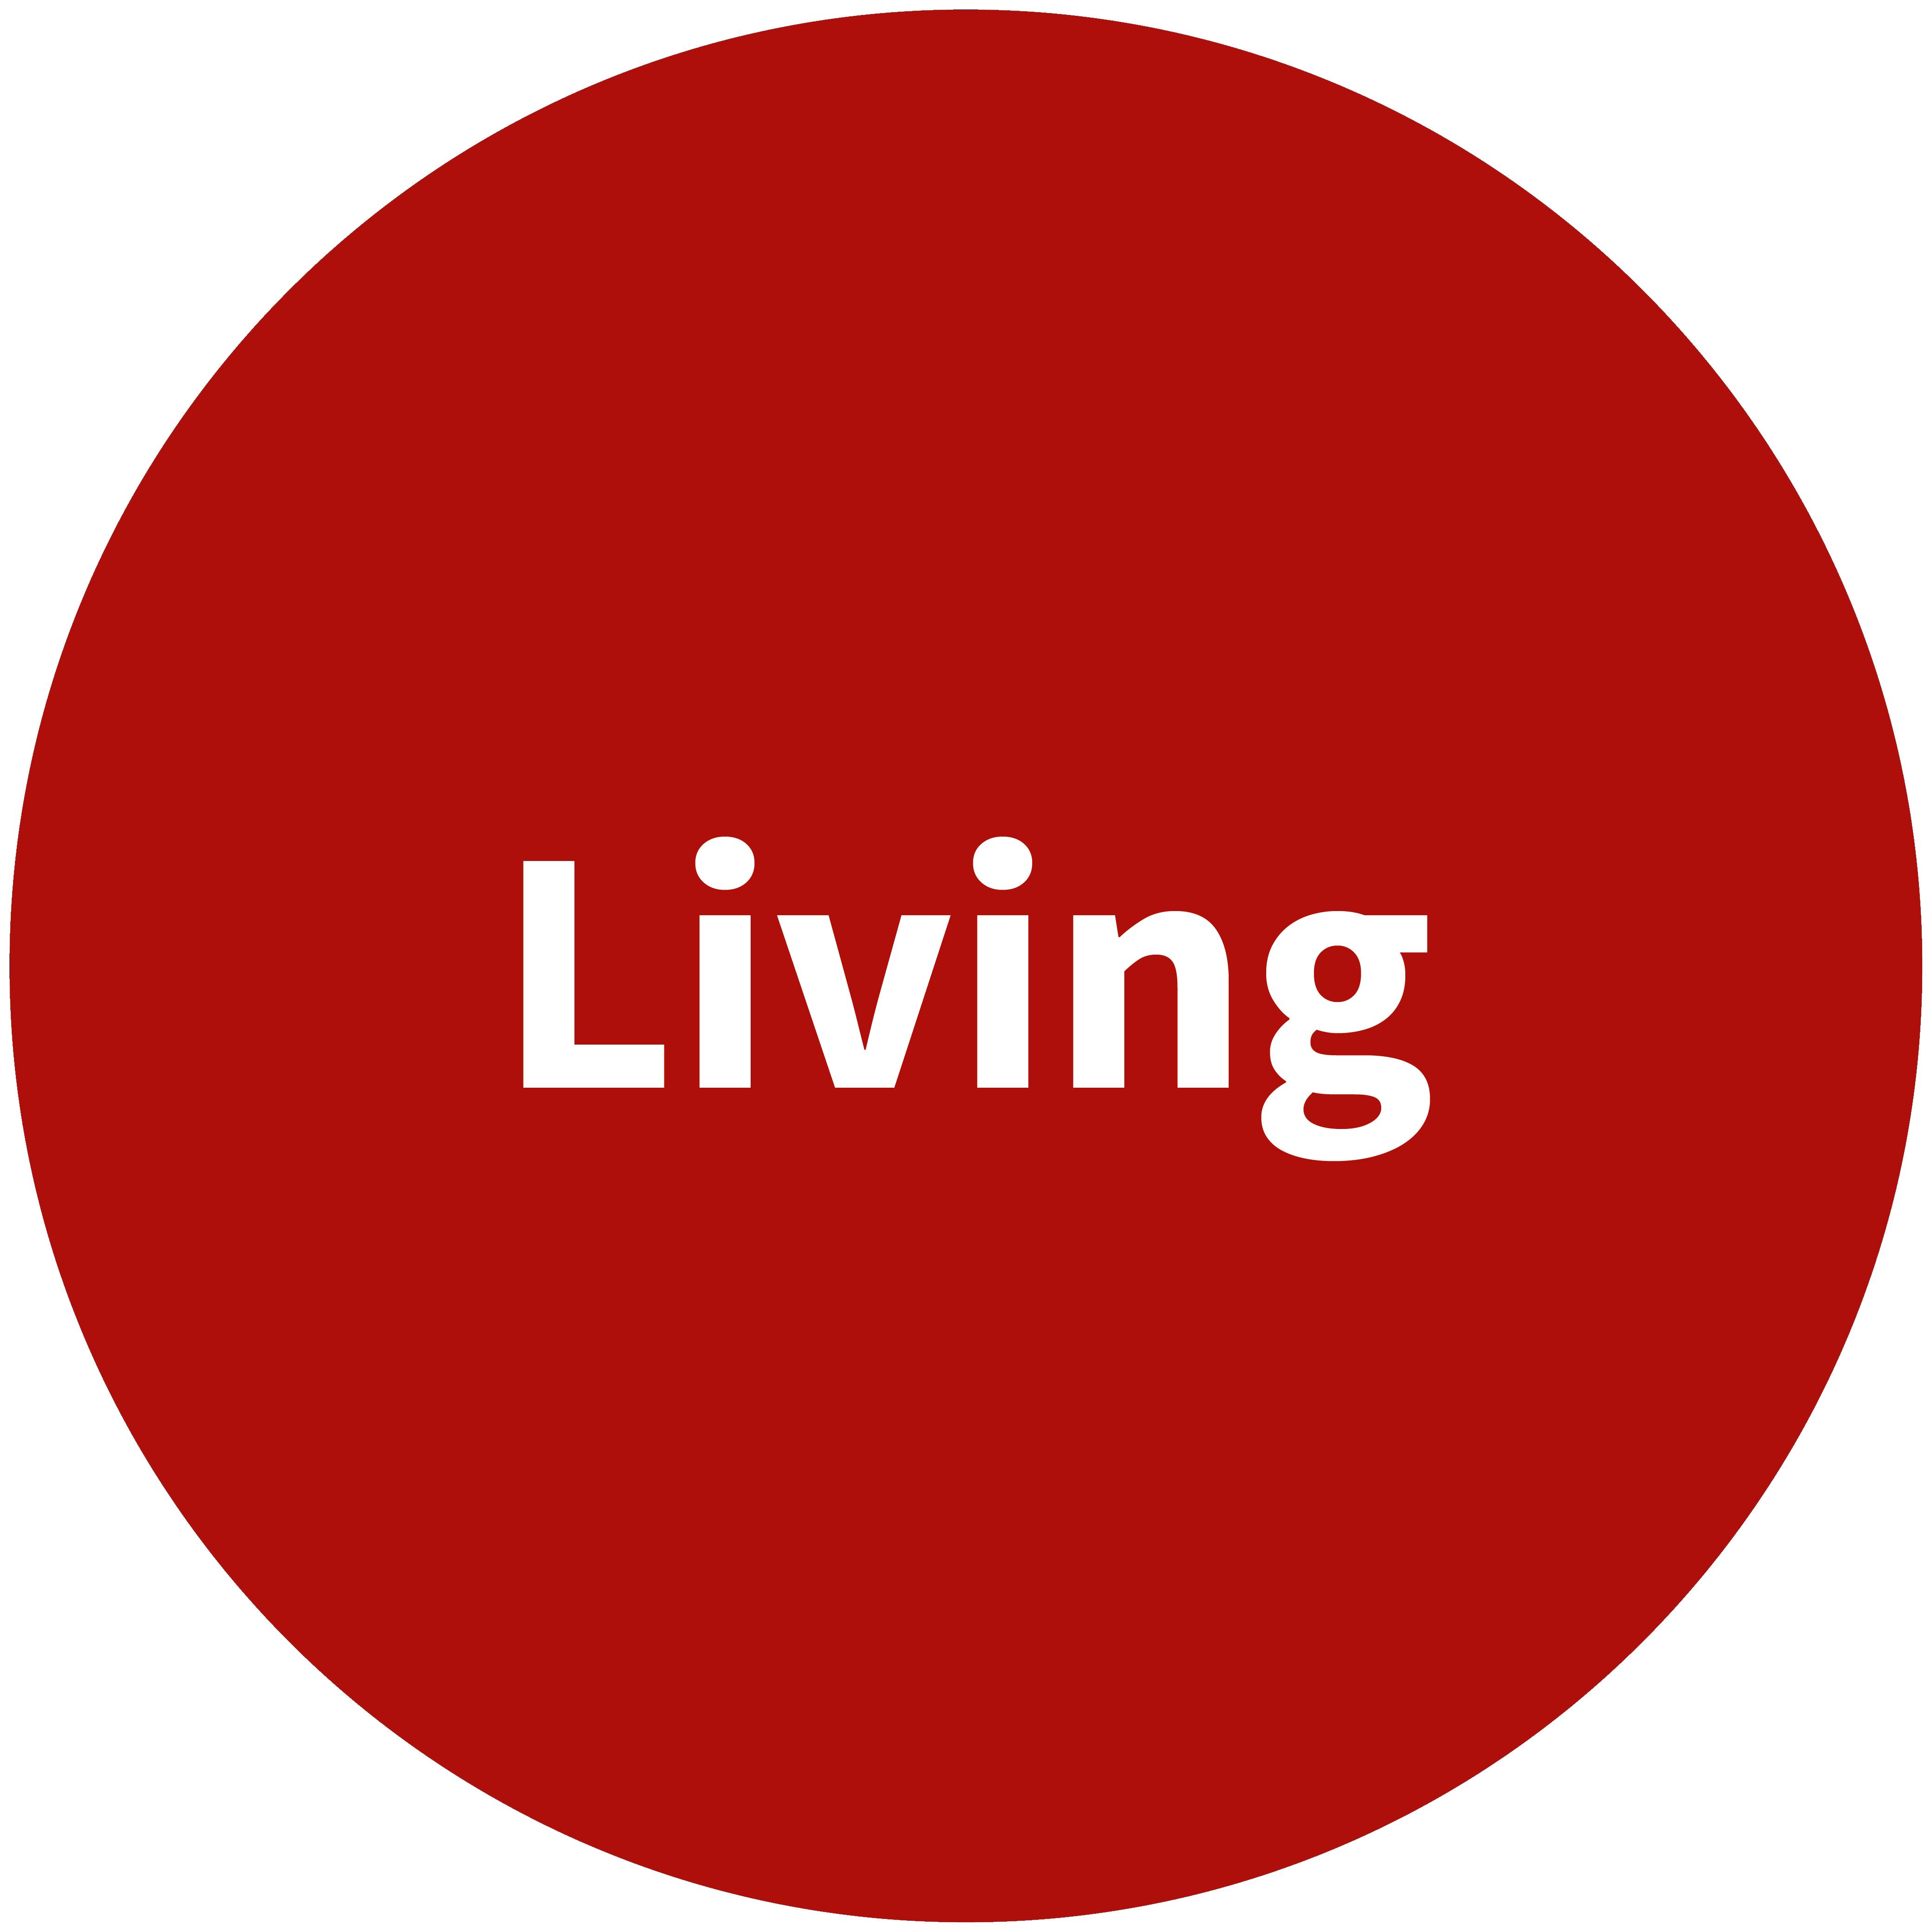 Visit the Brunata.One living webpage